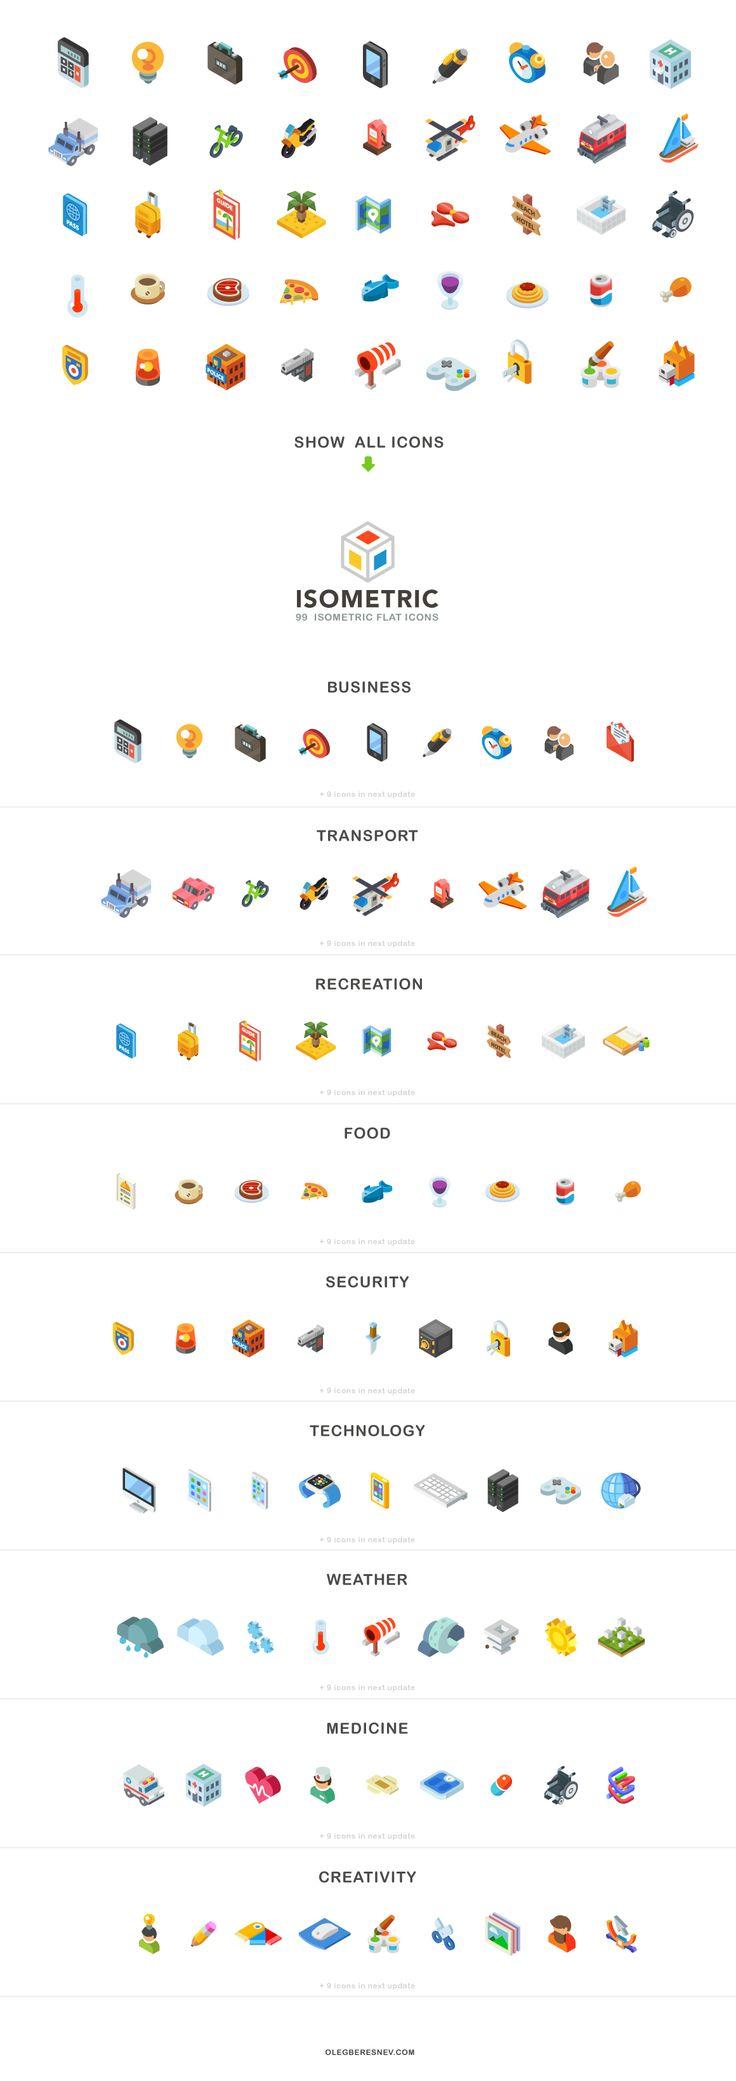 Isometric, 99 icon pack by Oleg Beresnev on Creative Market